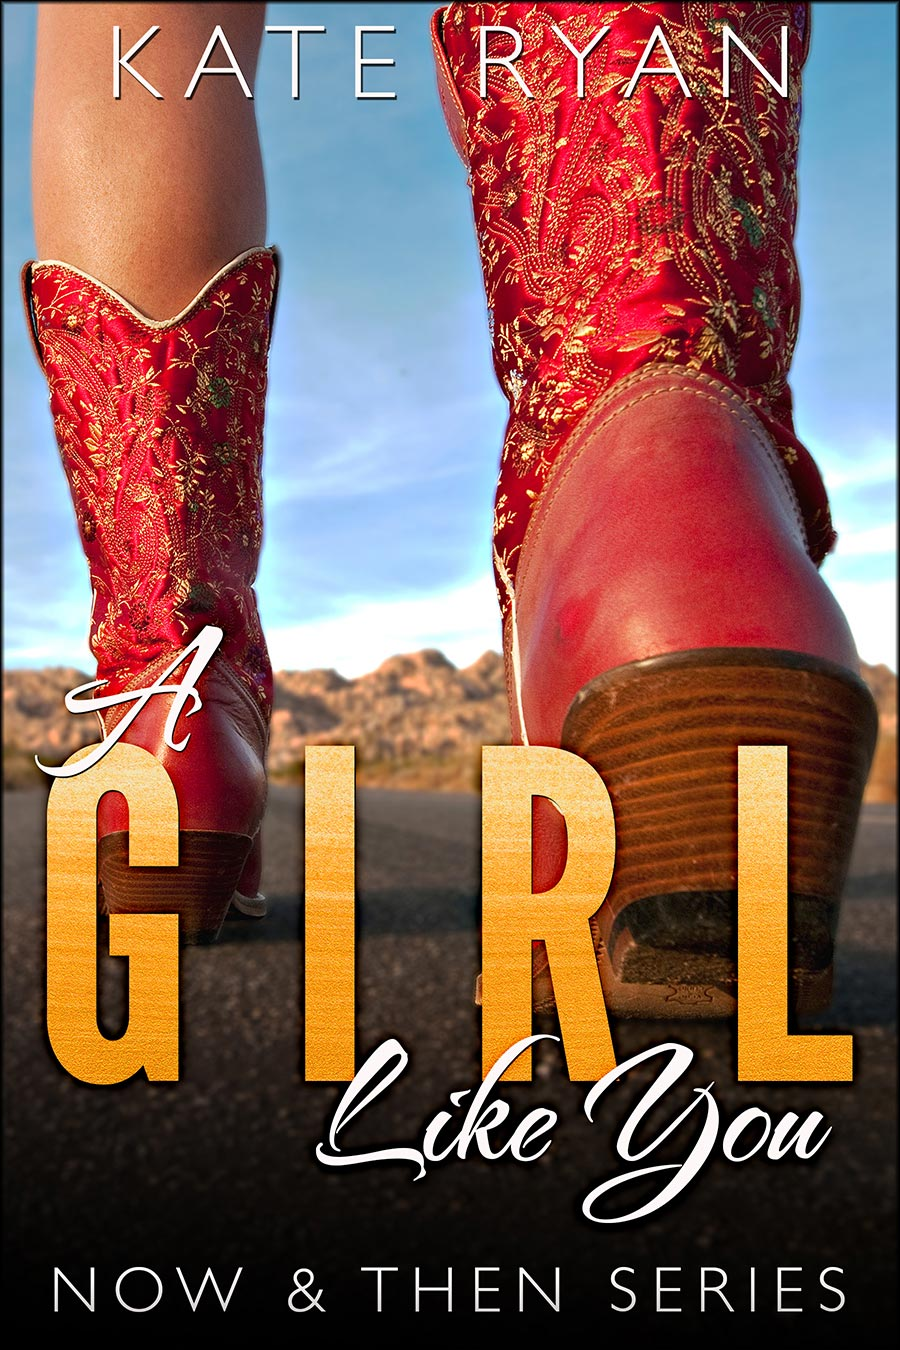 girl-like-you---kate-ryan---GIRL-IN-GOLD-TEXTURE.jpg